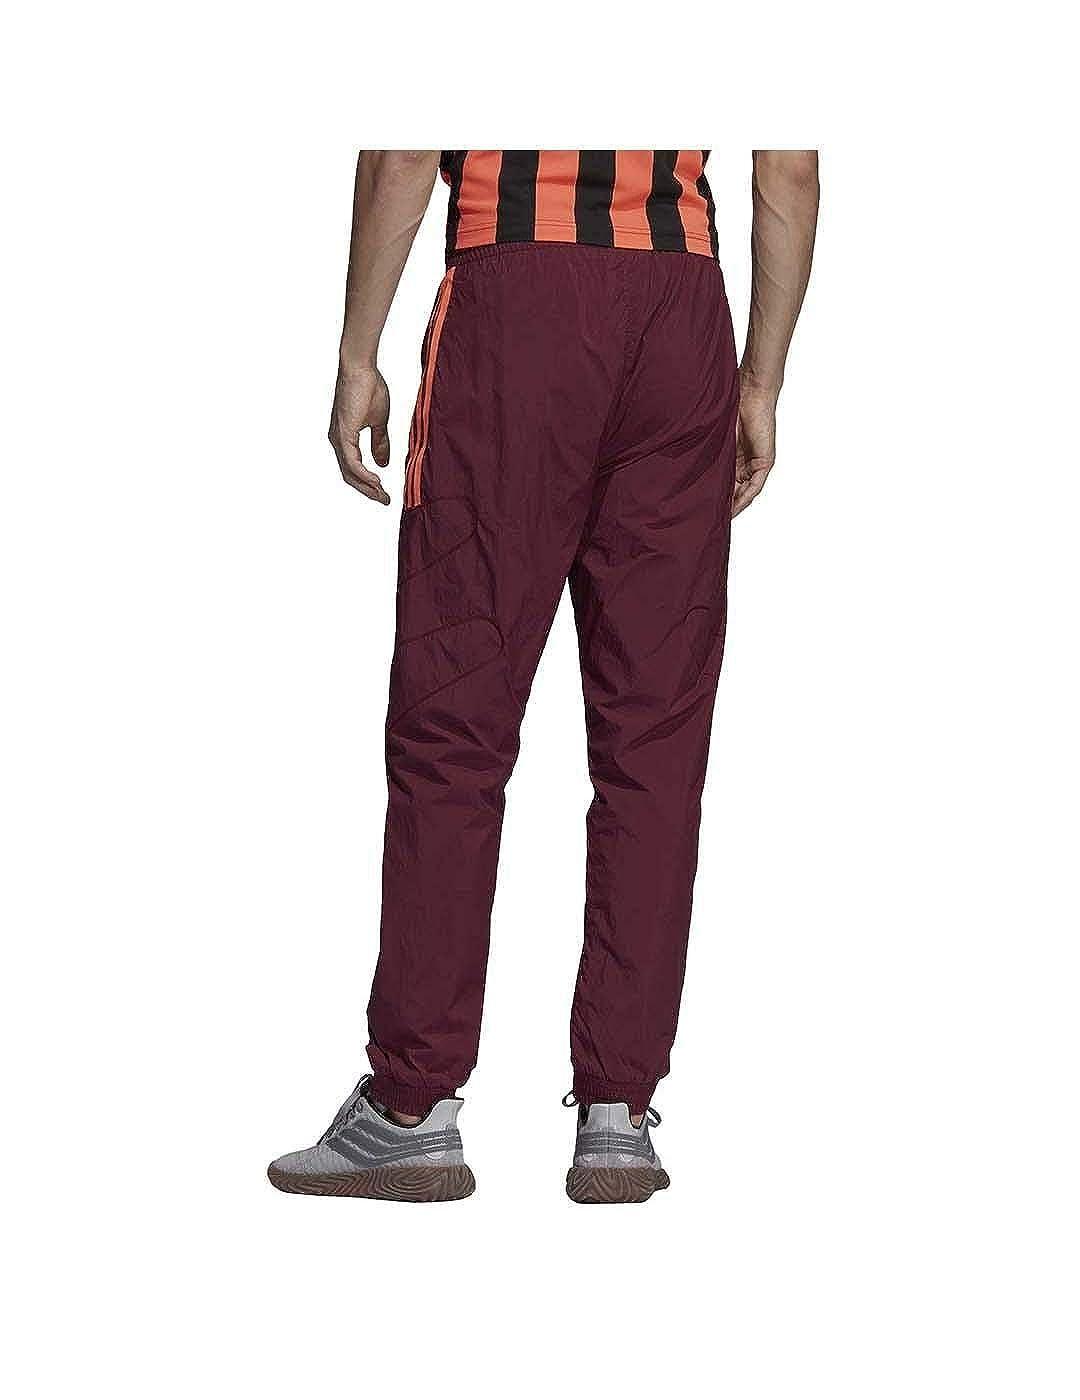 Adidas Flamestrk WV TP Uomo bordò: Amazon.it: Abbigliamento